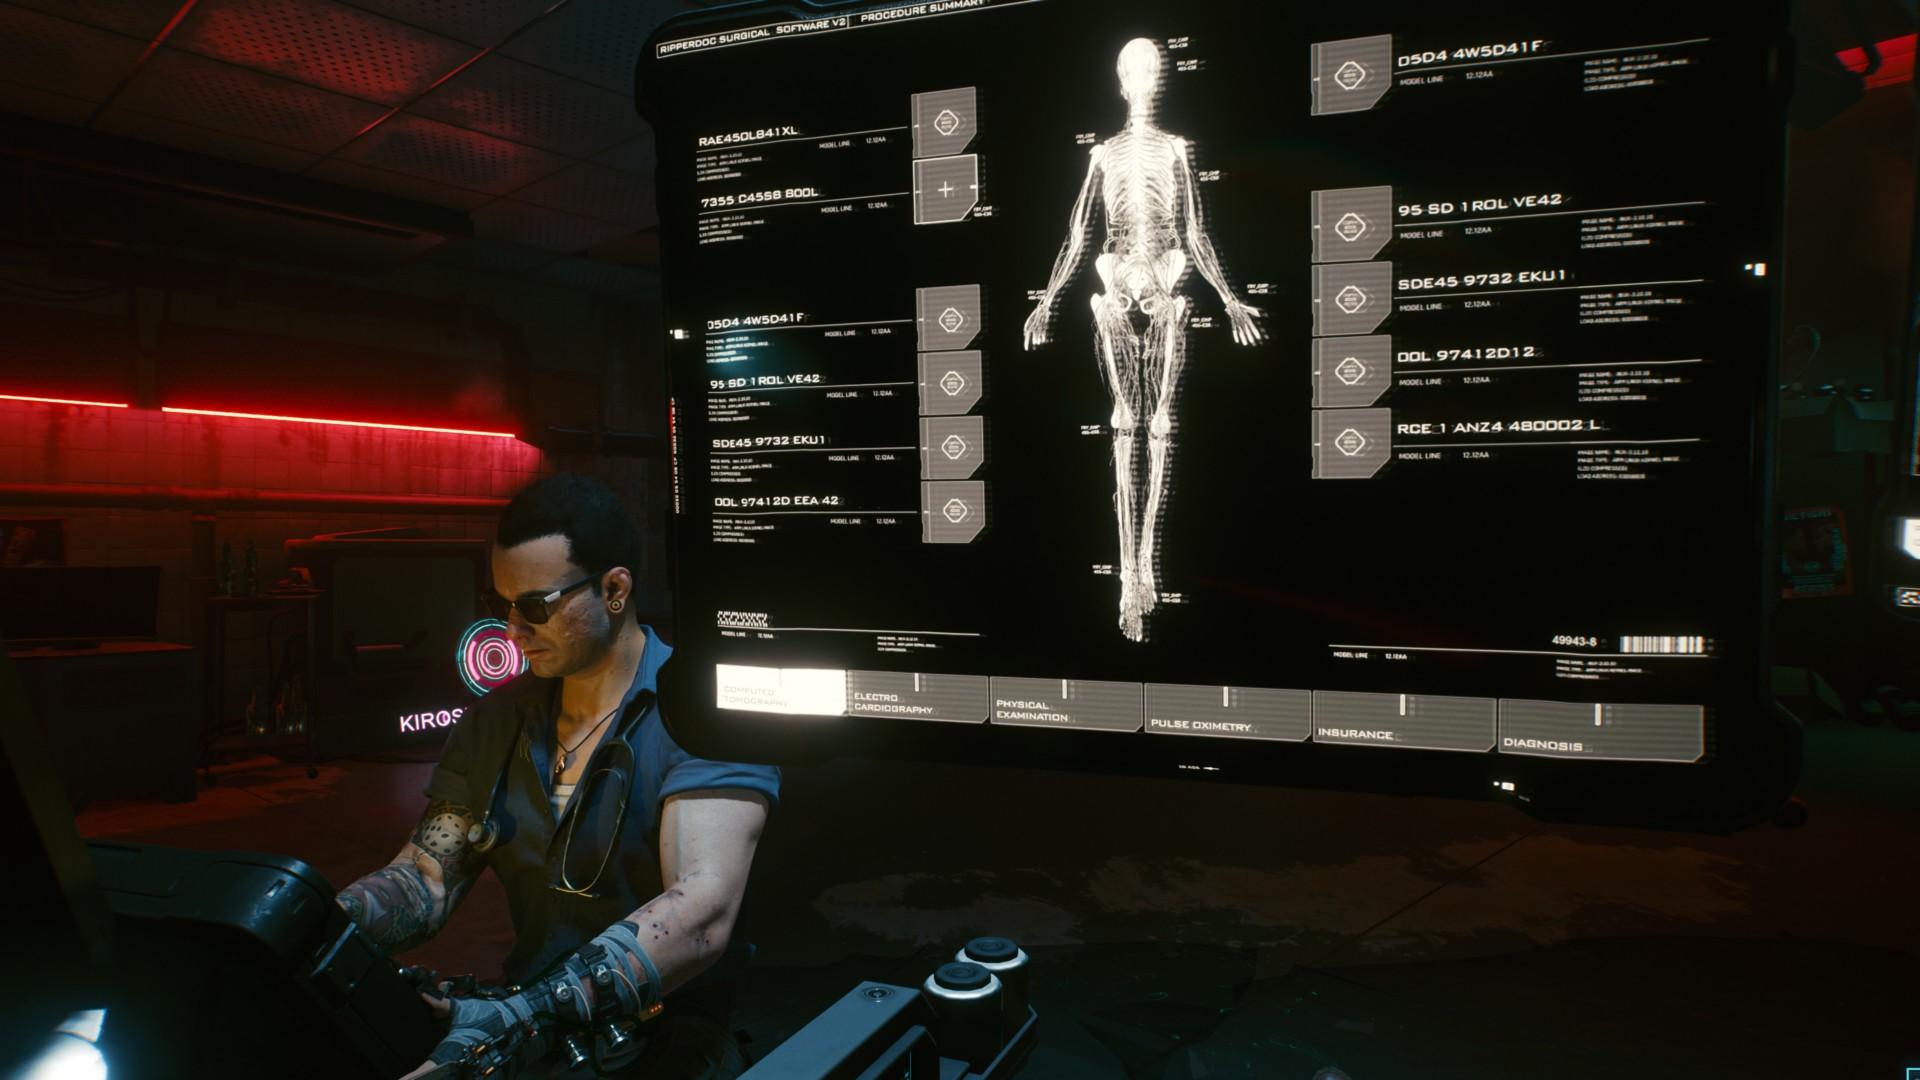 Cyberpunk 2077: Cyberware implants and the Ripperdoc's Tabula E-Rasa